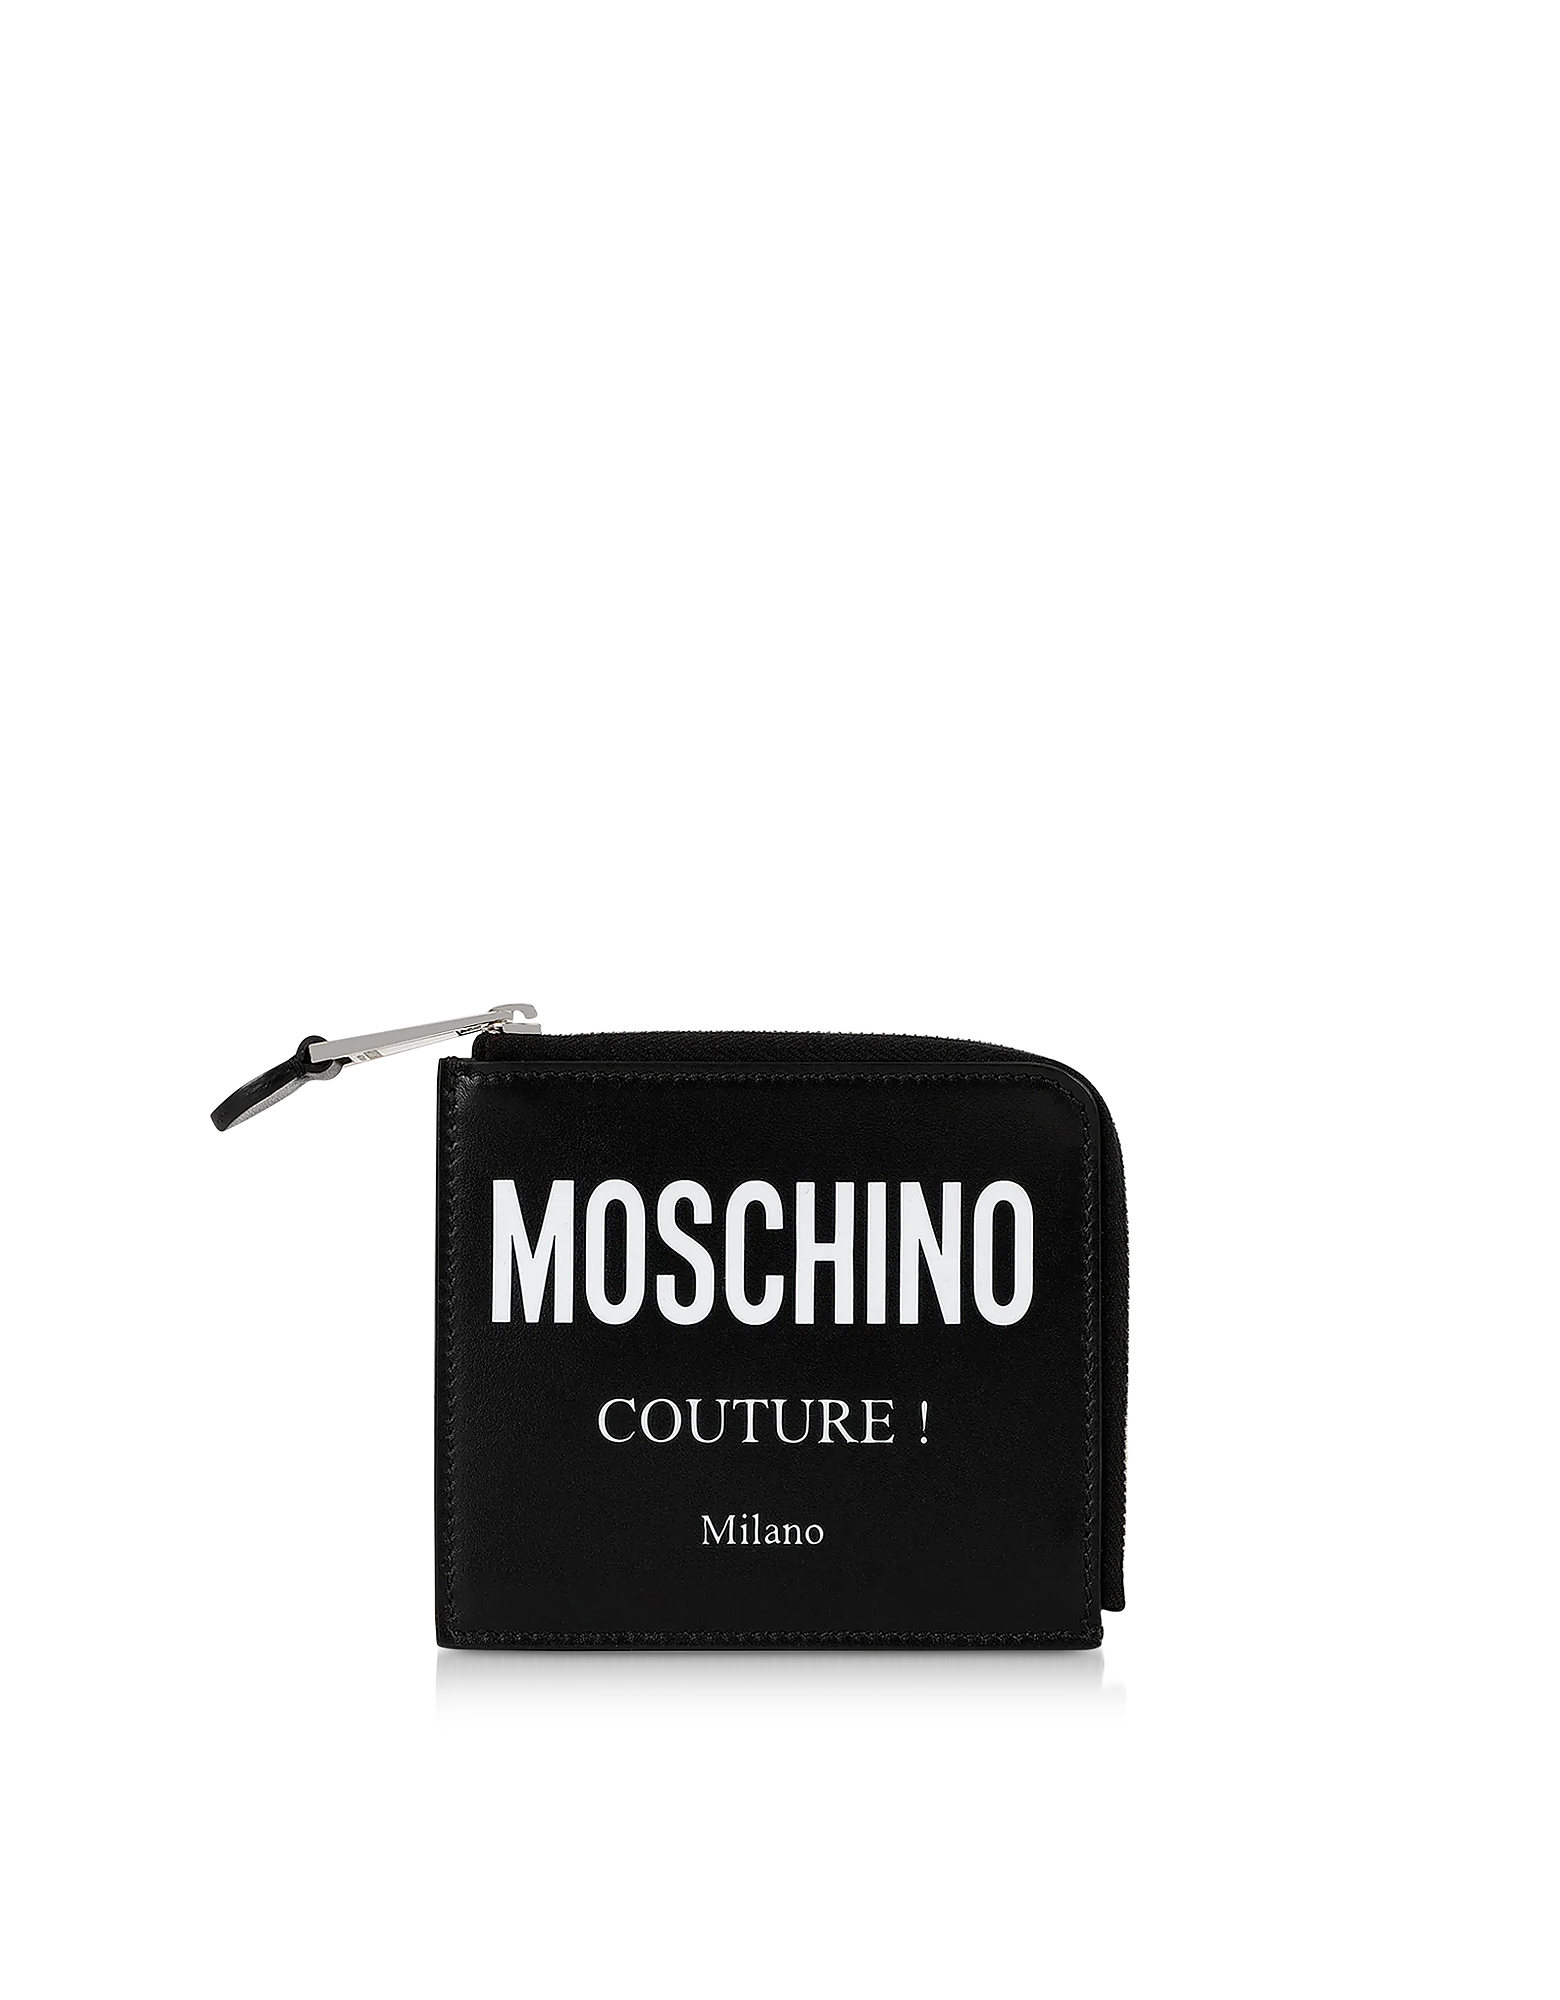 Moschino  Wallets Black Signature Zip Around Coin Purse (xm160120-003-00) photo